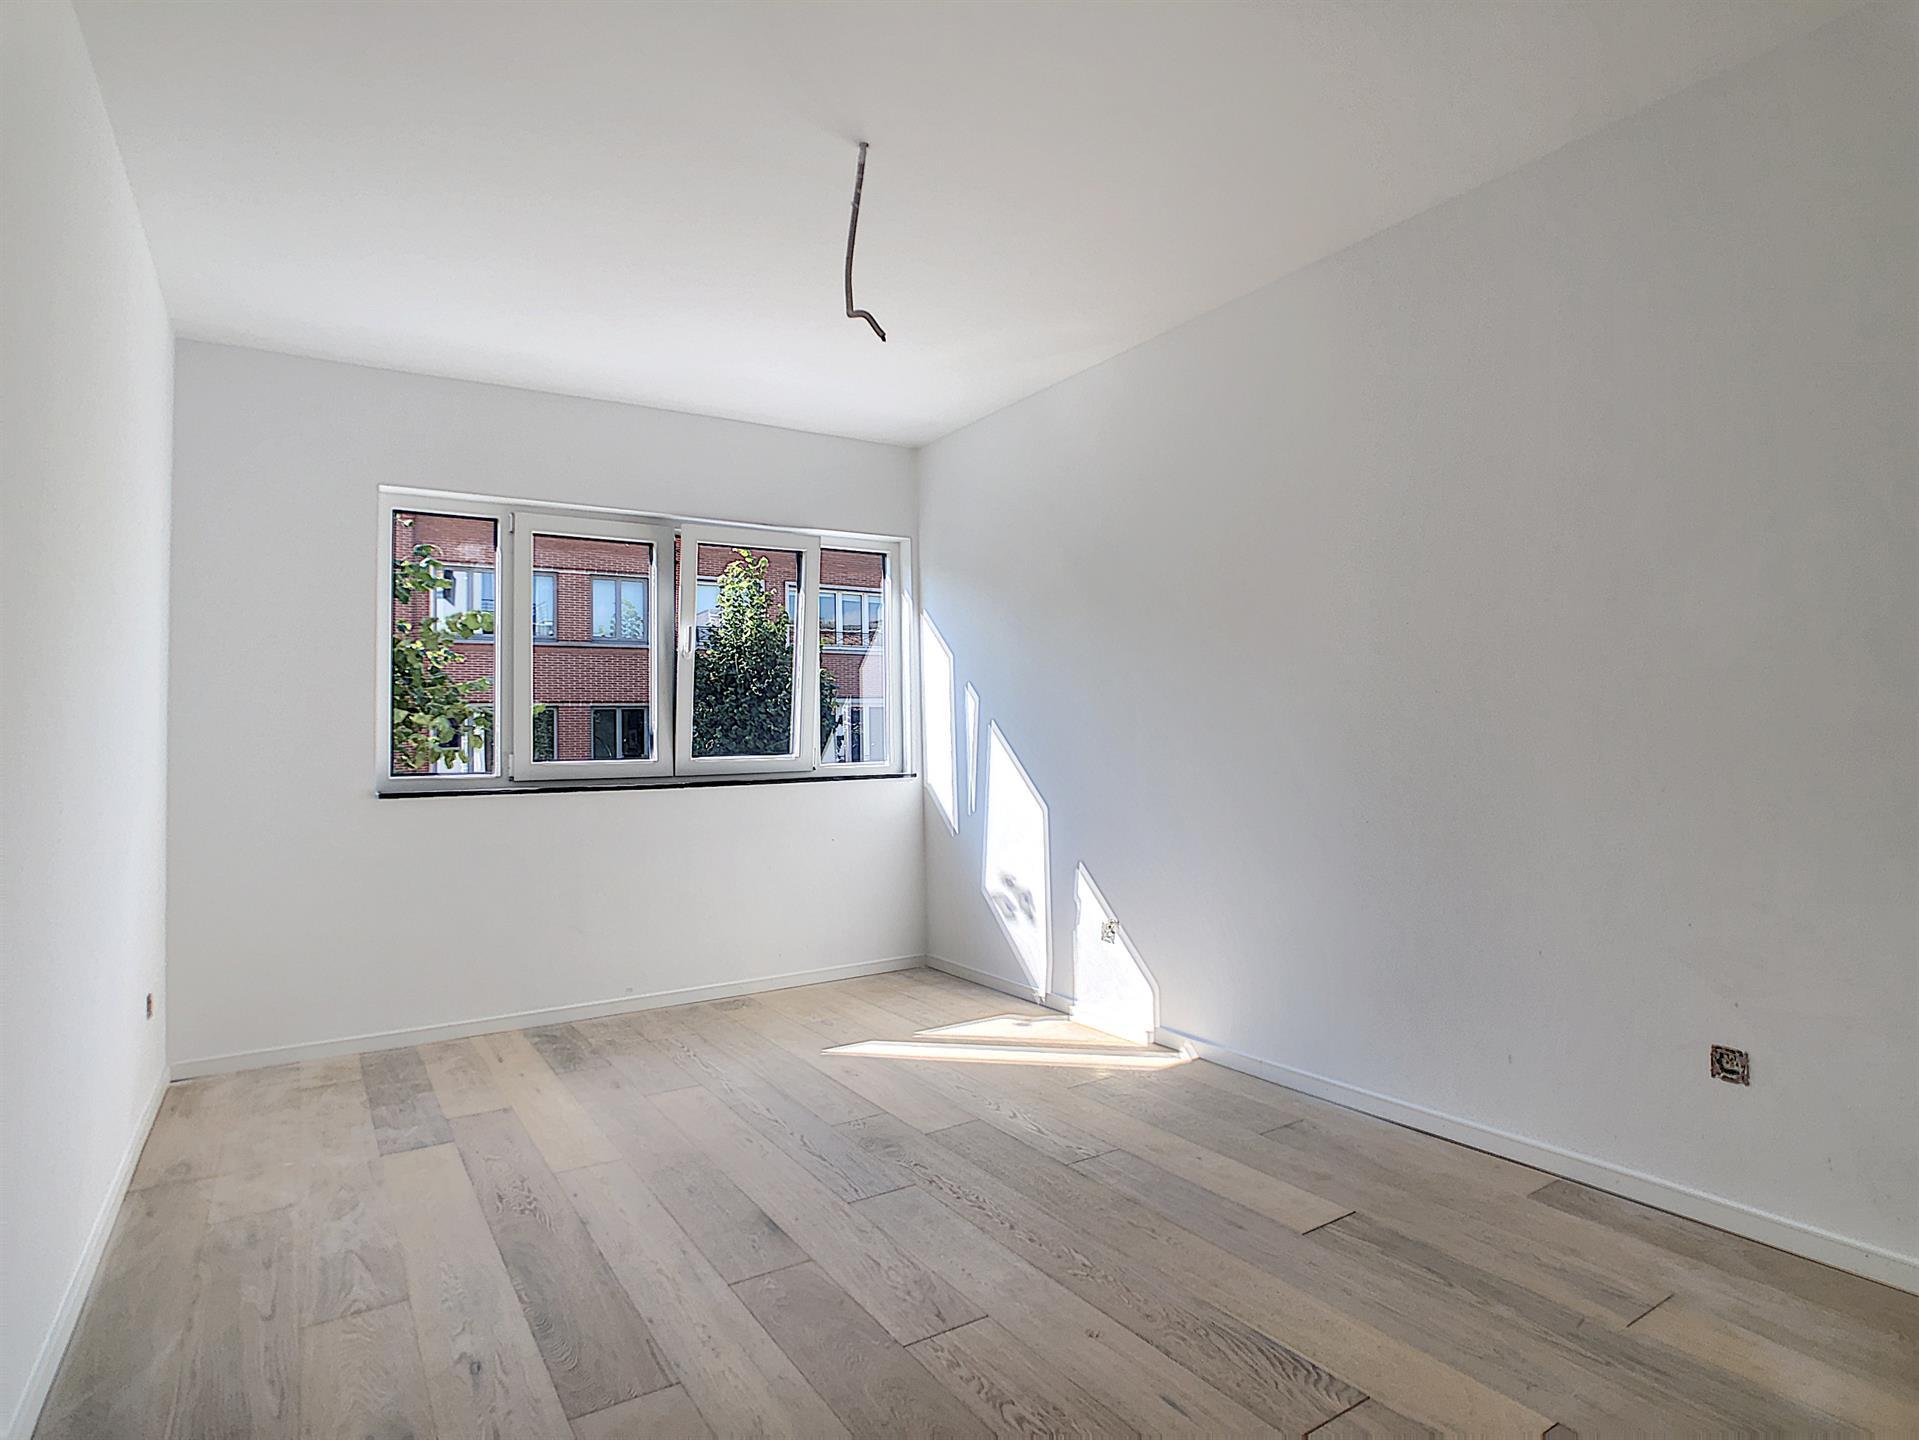 Appartement - Anderlecht - #4252376-0